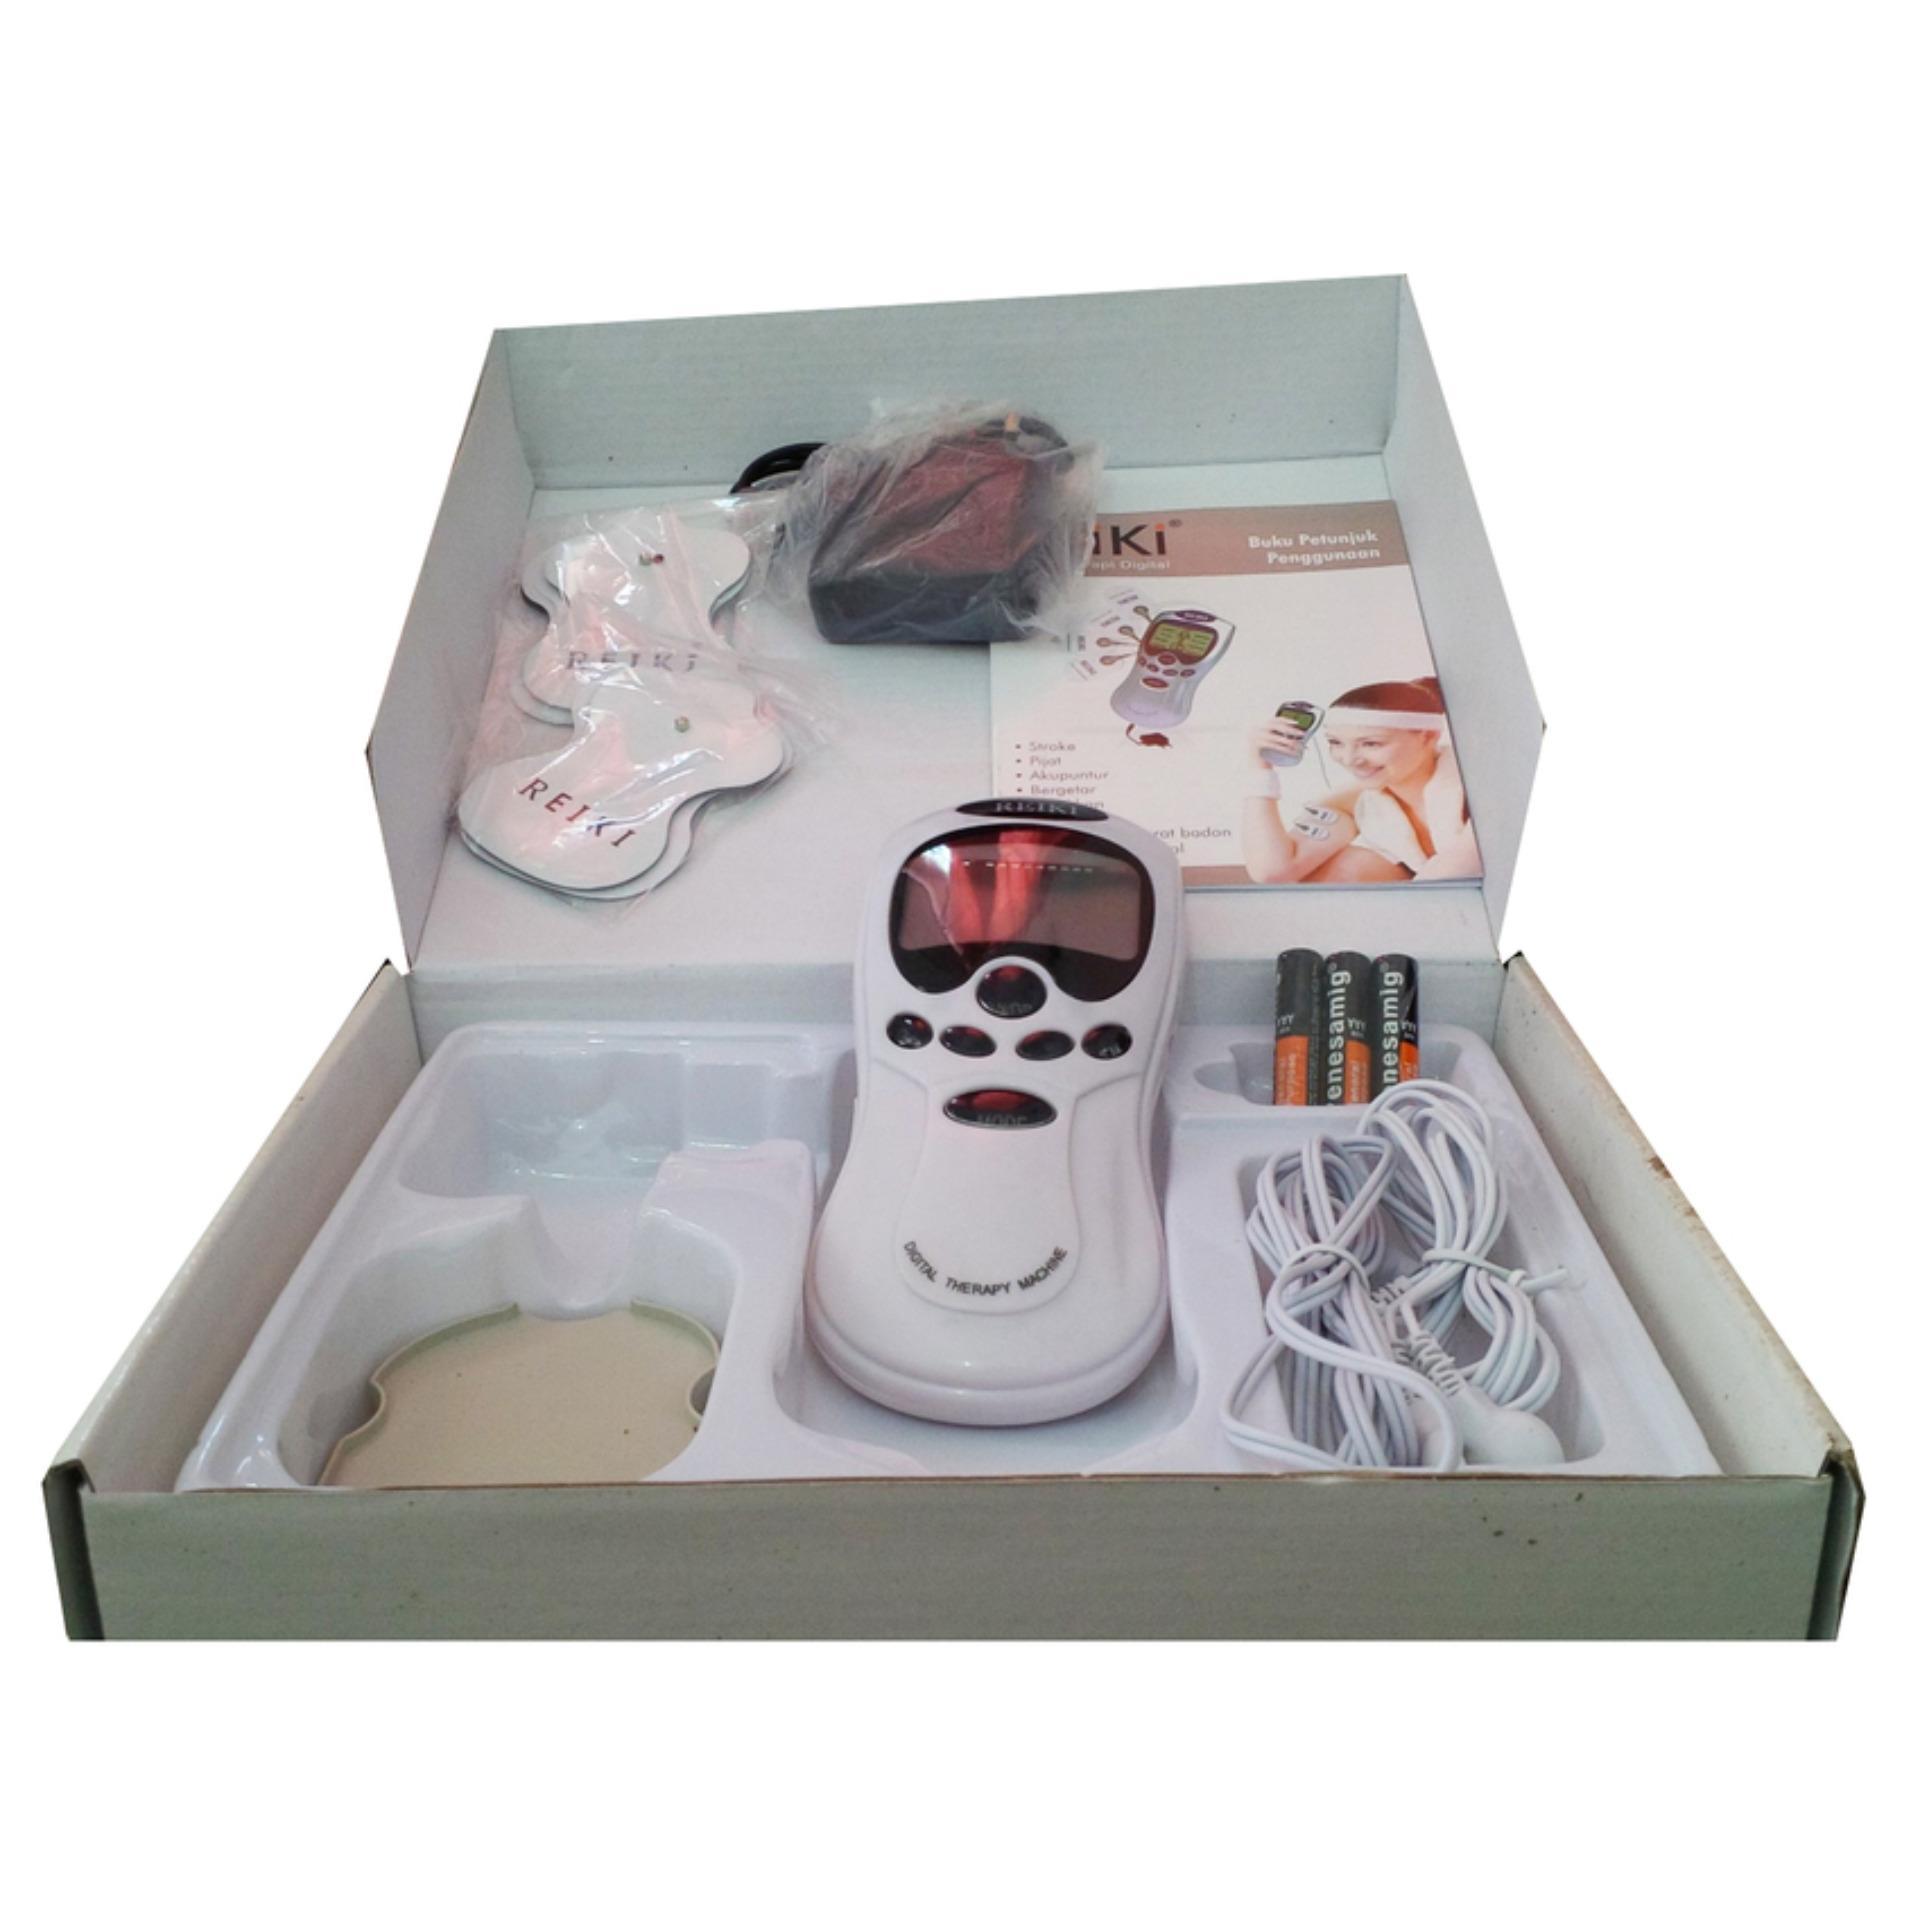 Flash Sale Reiki Alat Pijat Akupuntur Refleksi Portable